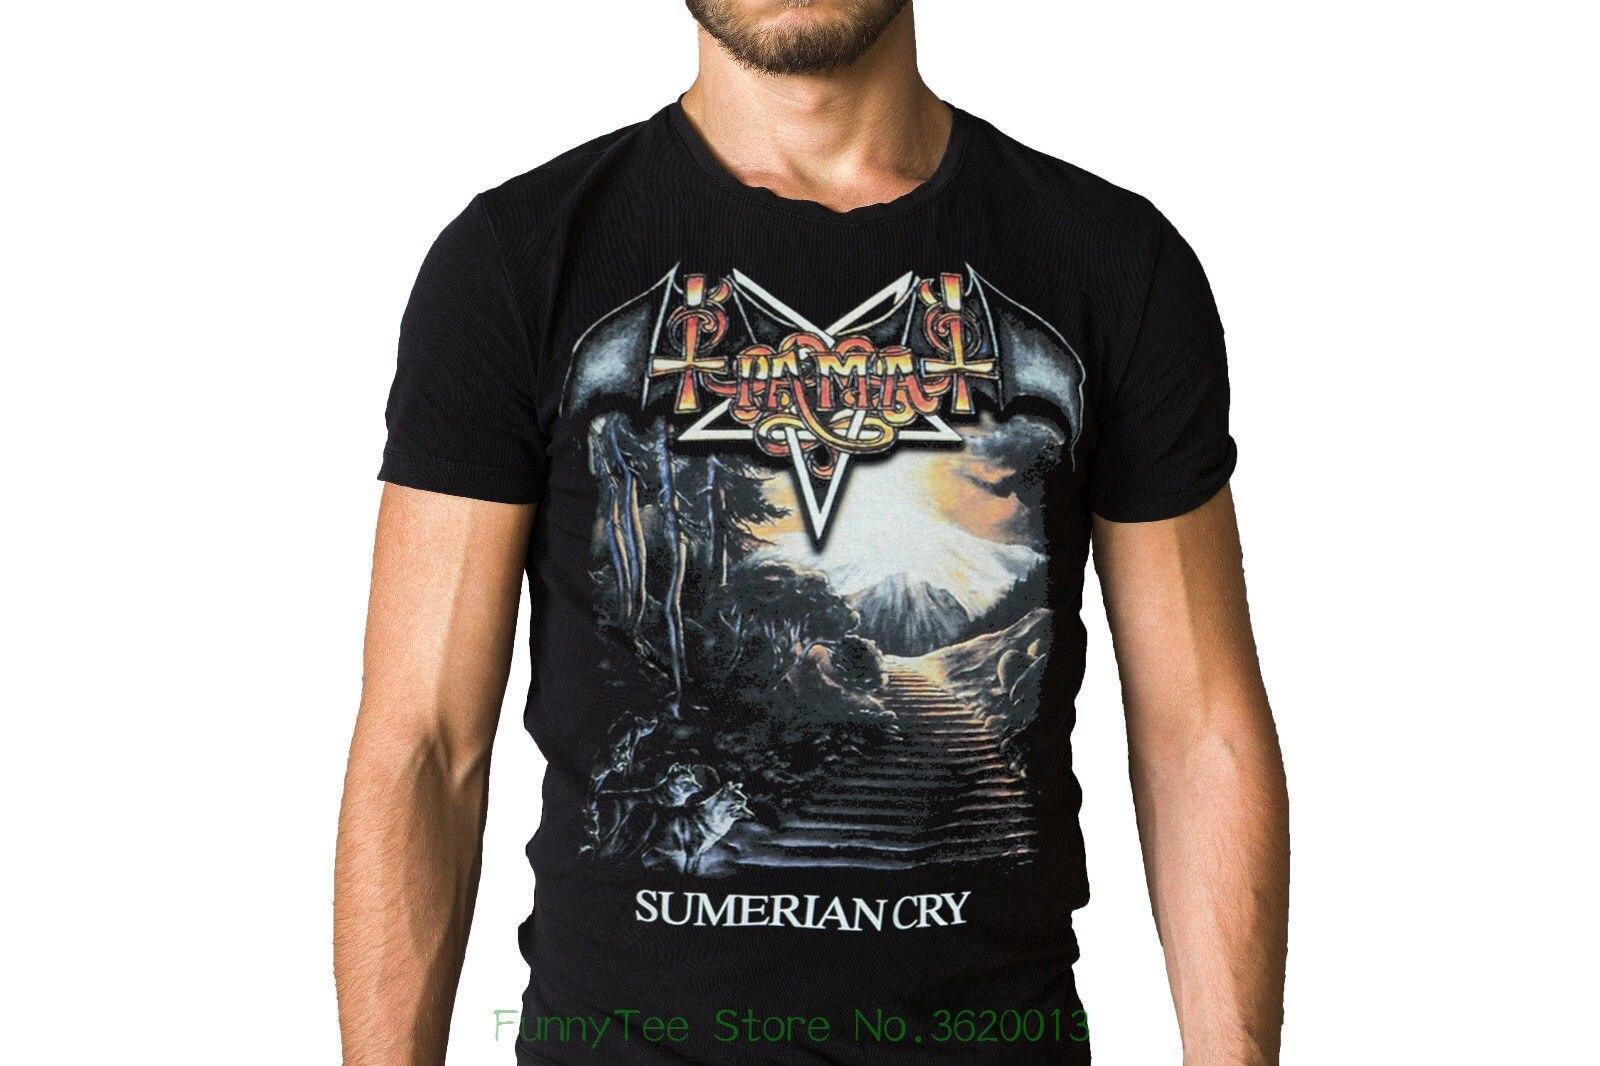 Tiamat sumerio llorar 1990 camiseta con portada del disco